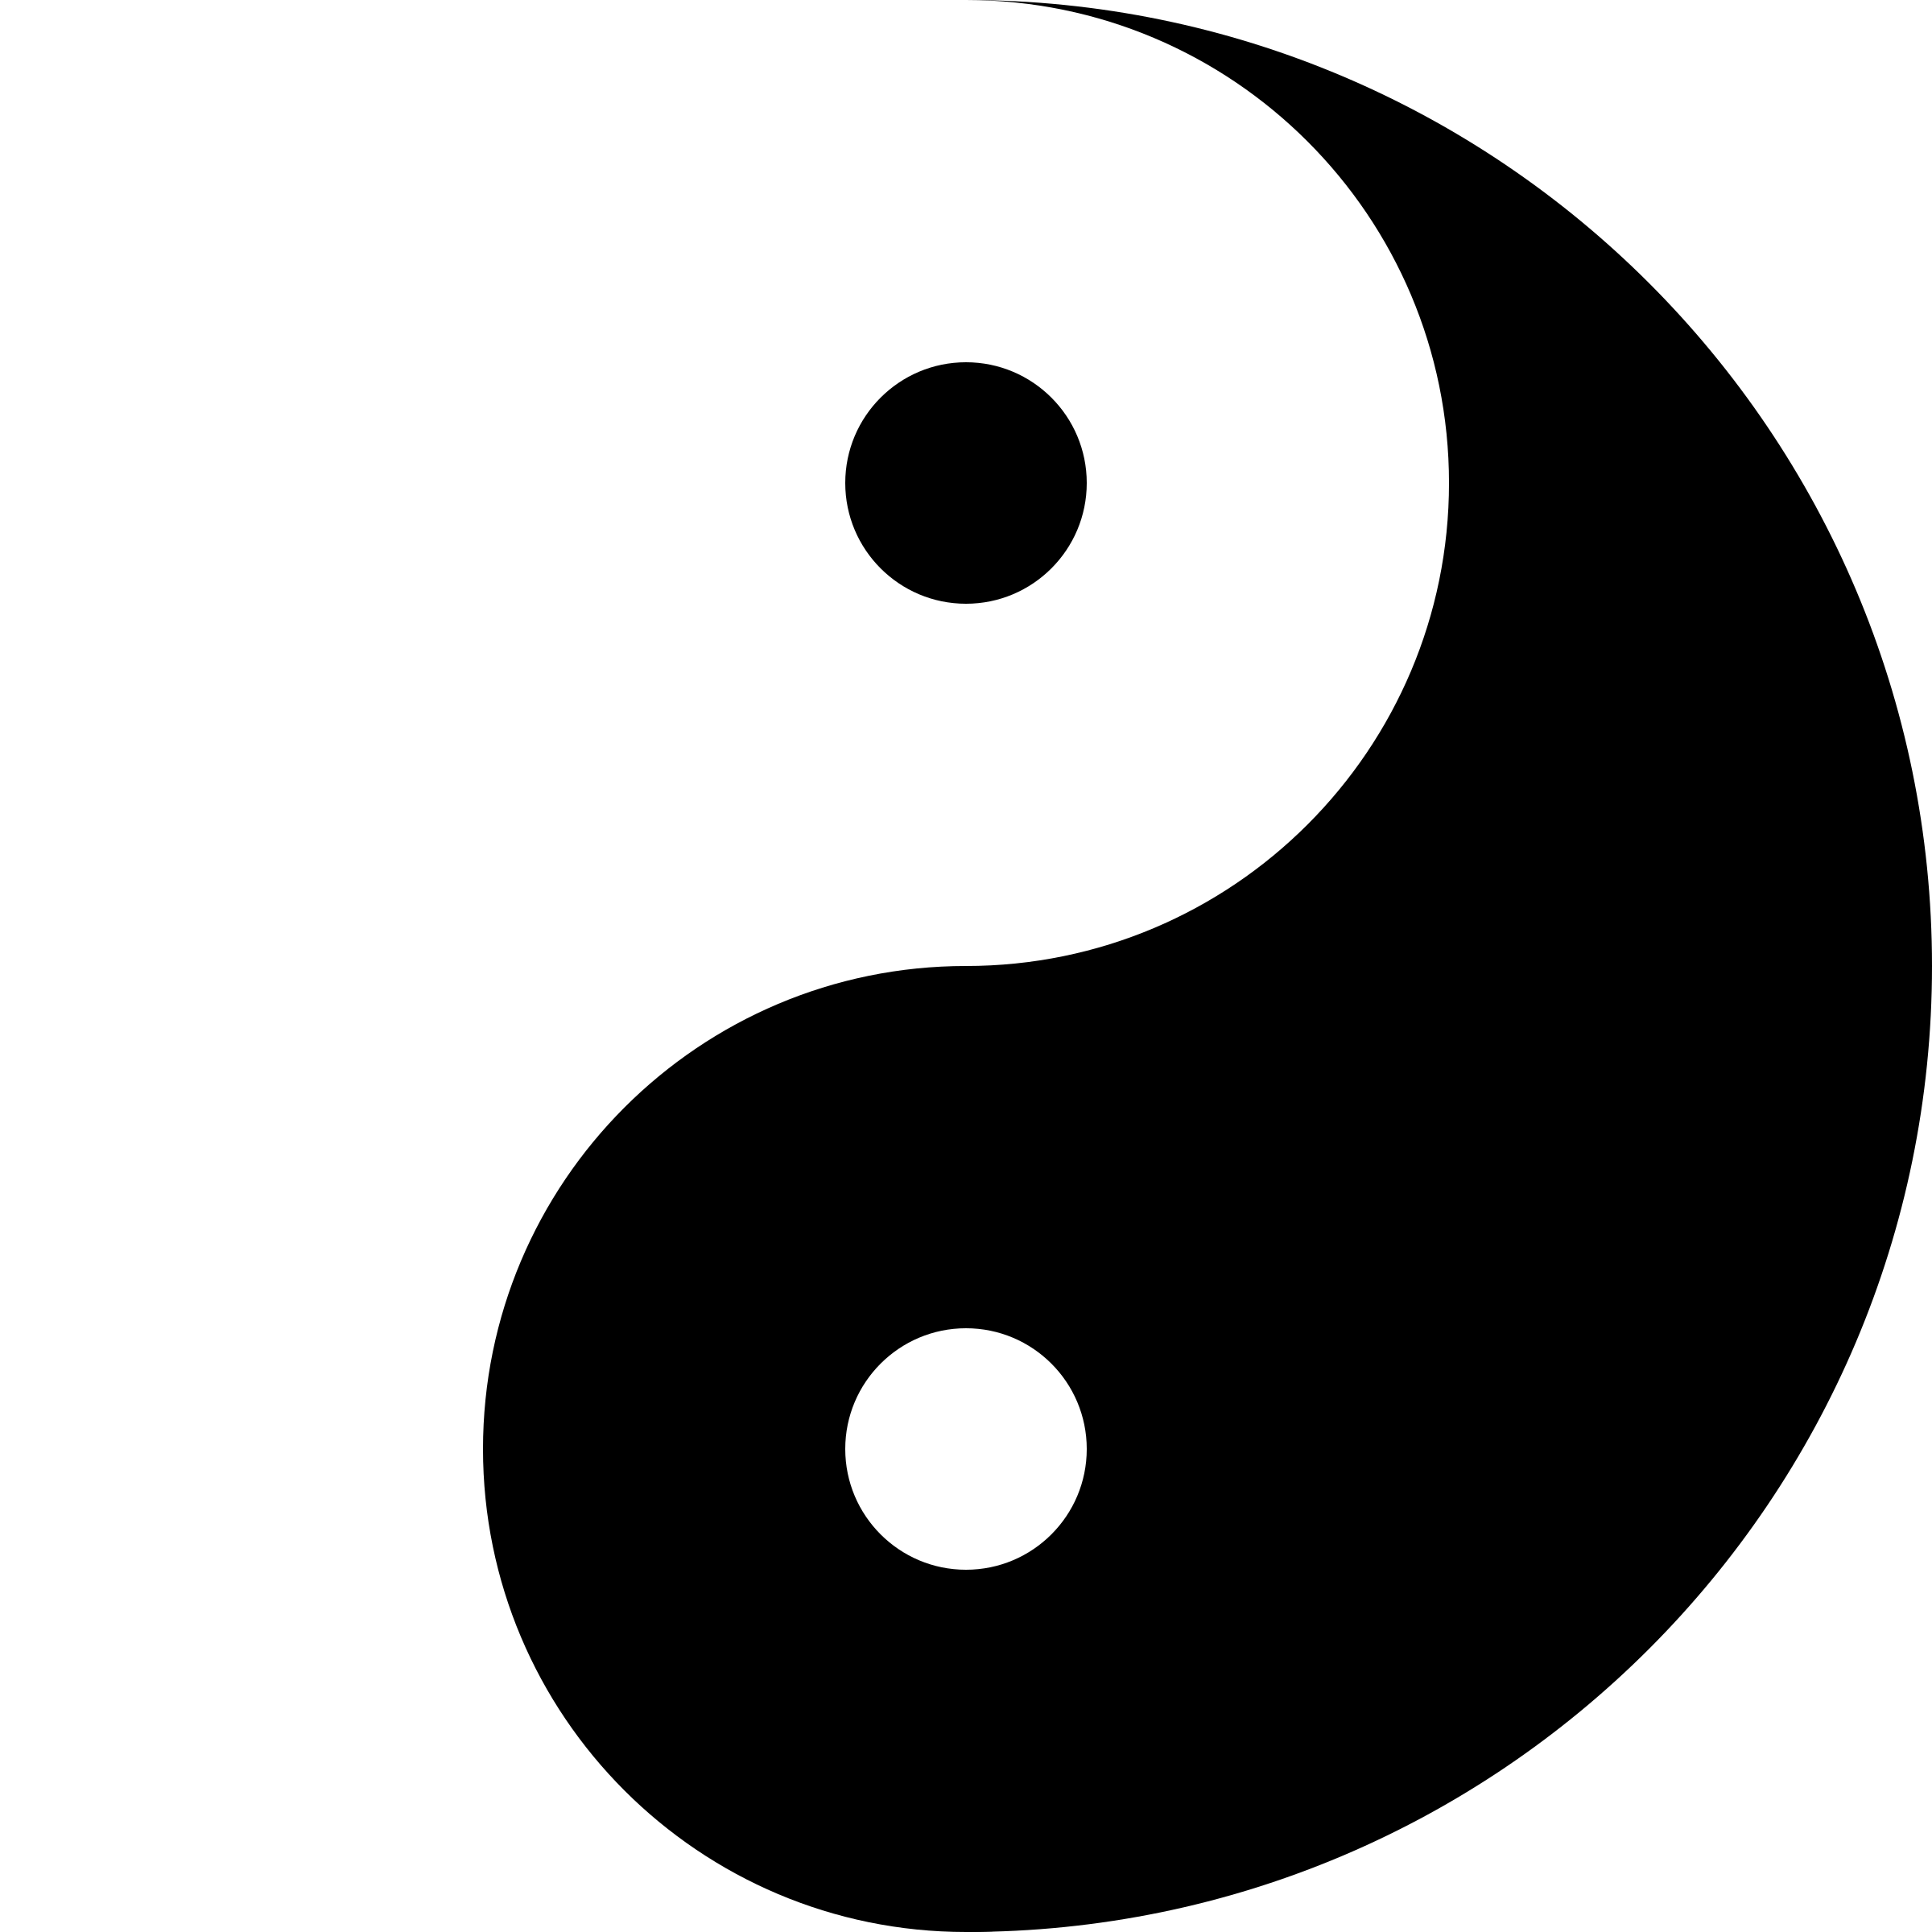 Yin Yang, From Uploaded